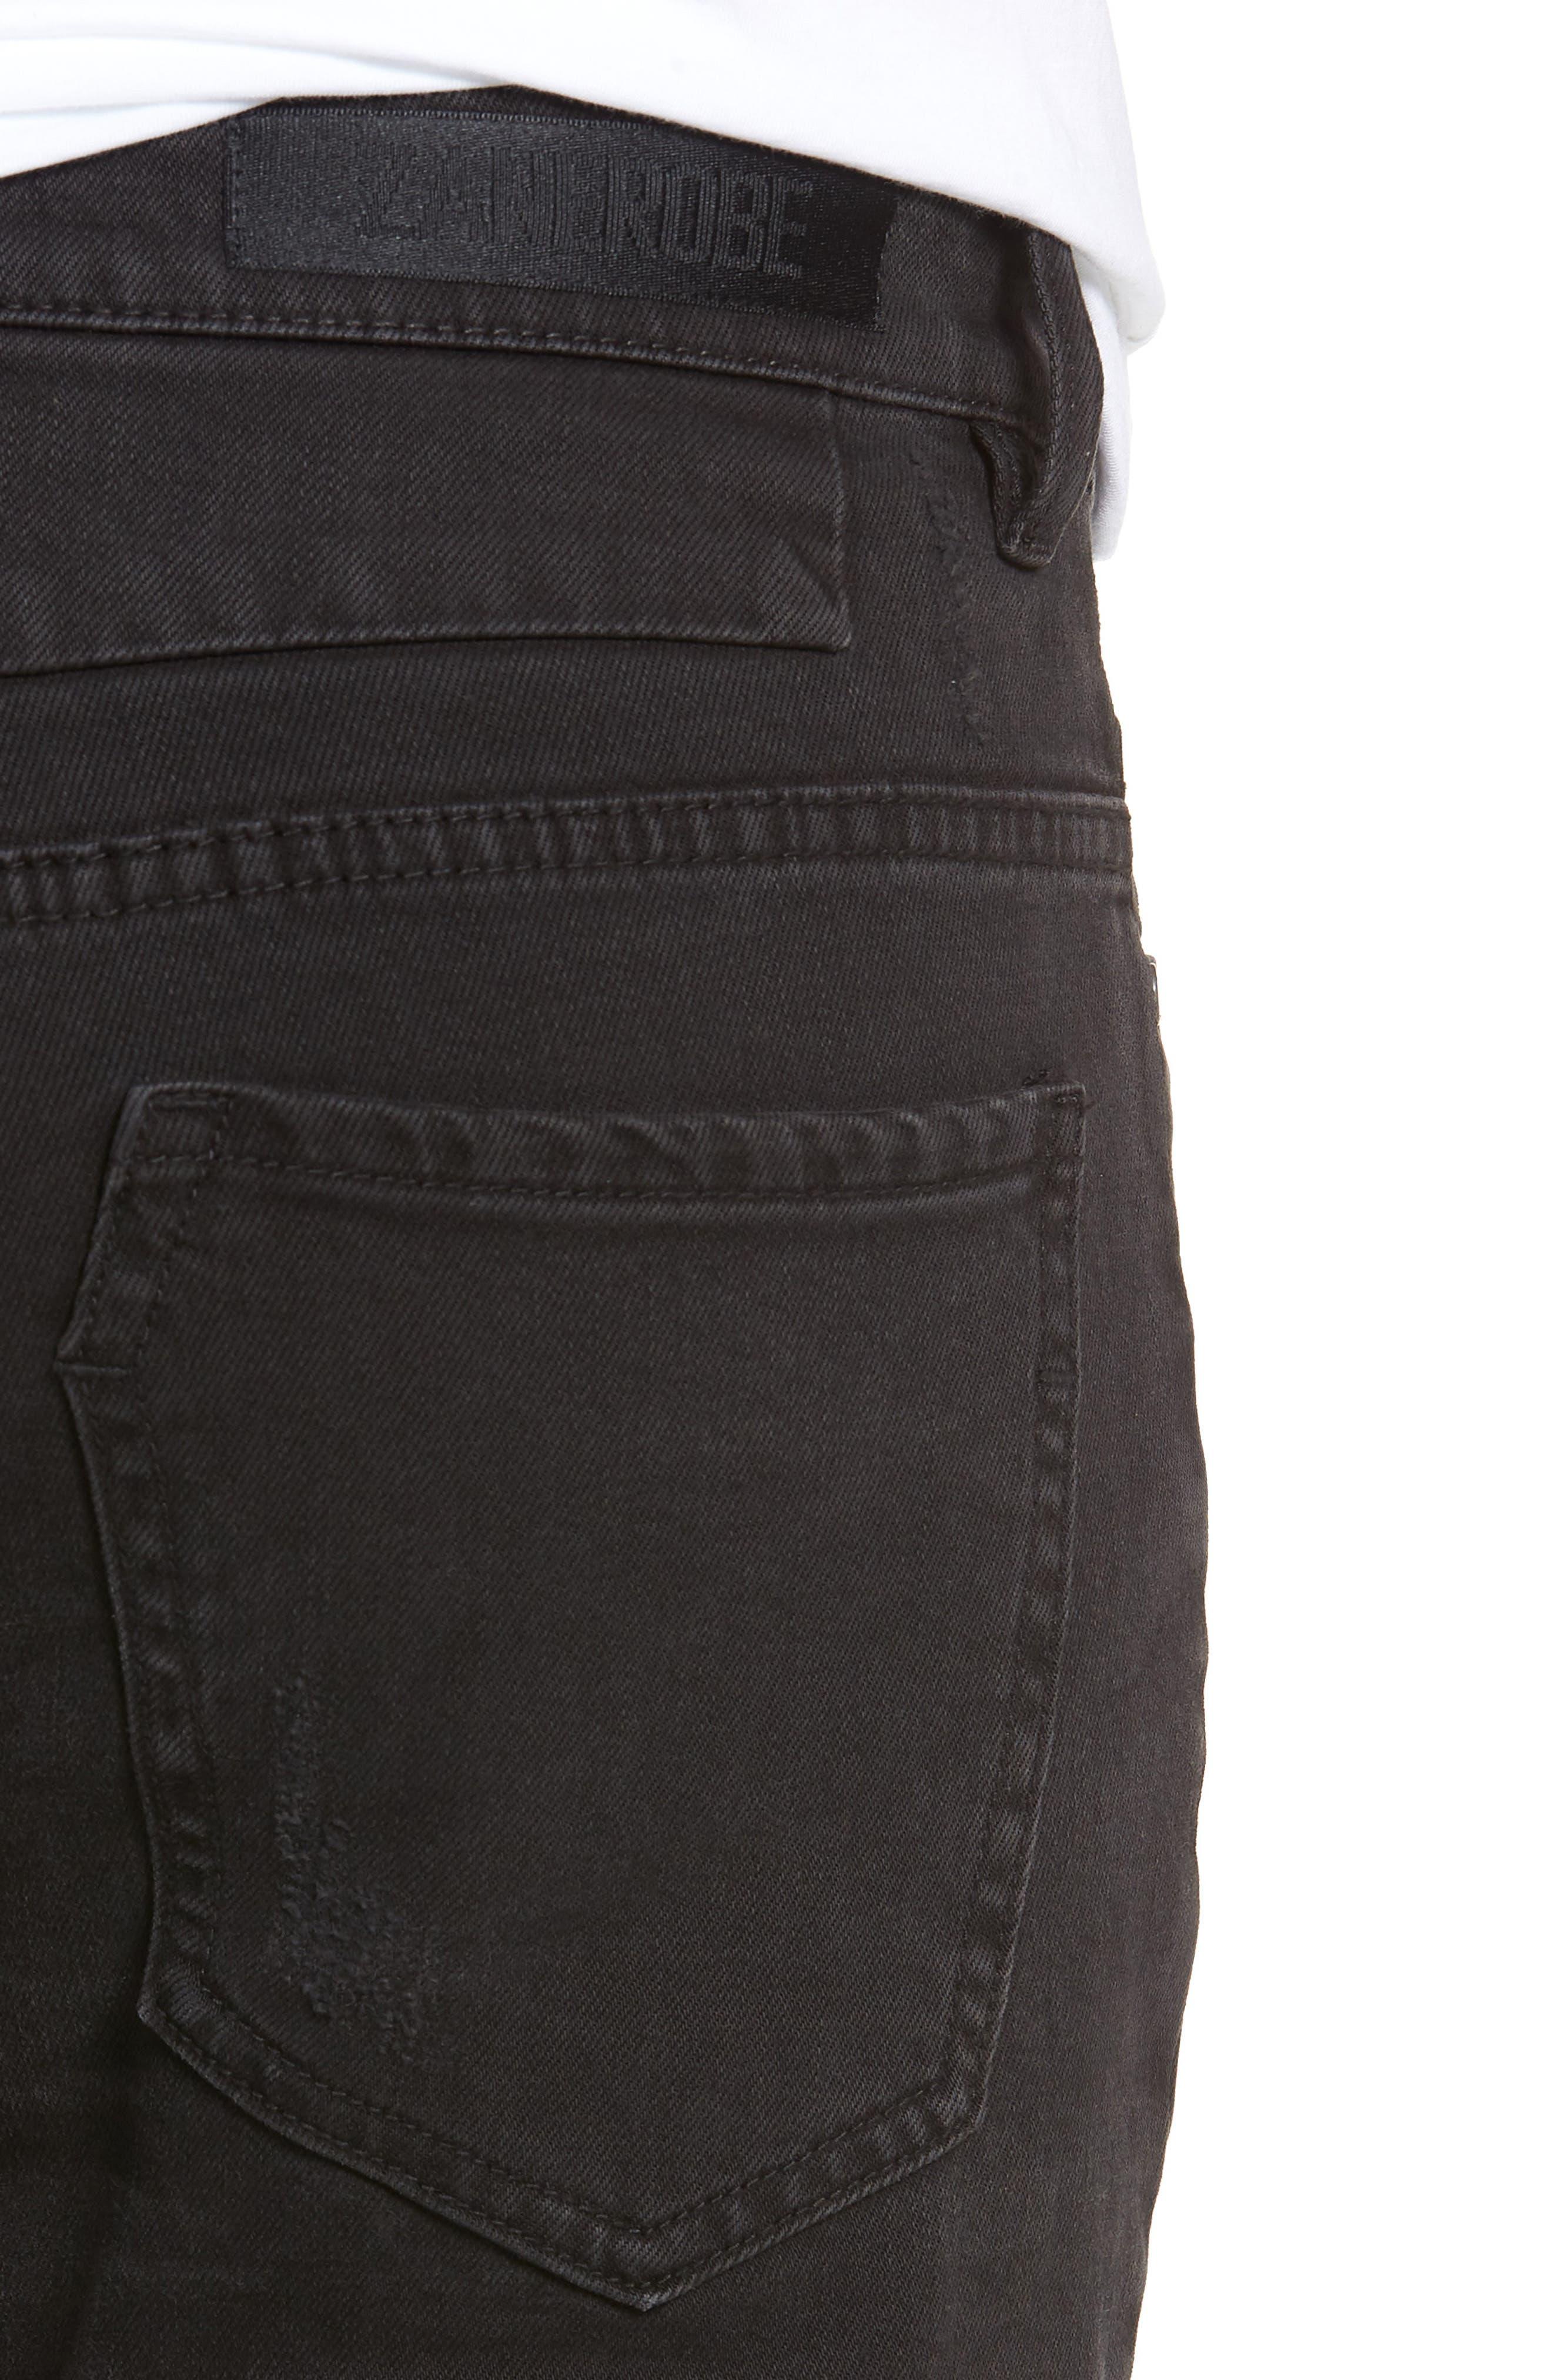 Joe Blow Slim Fit Jeans,                             Alternate thumbnail 4, color,                             BUSTED BLACK